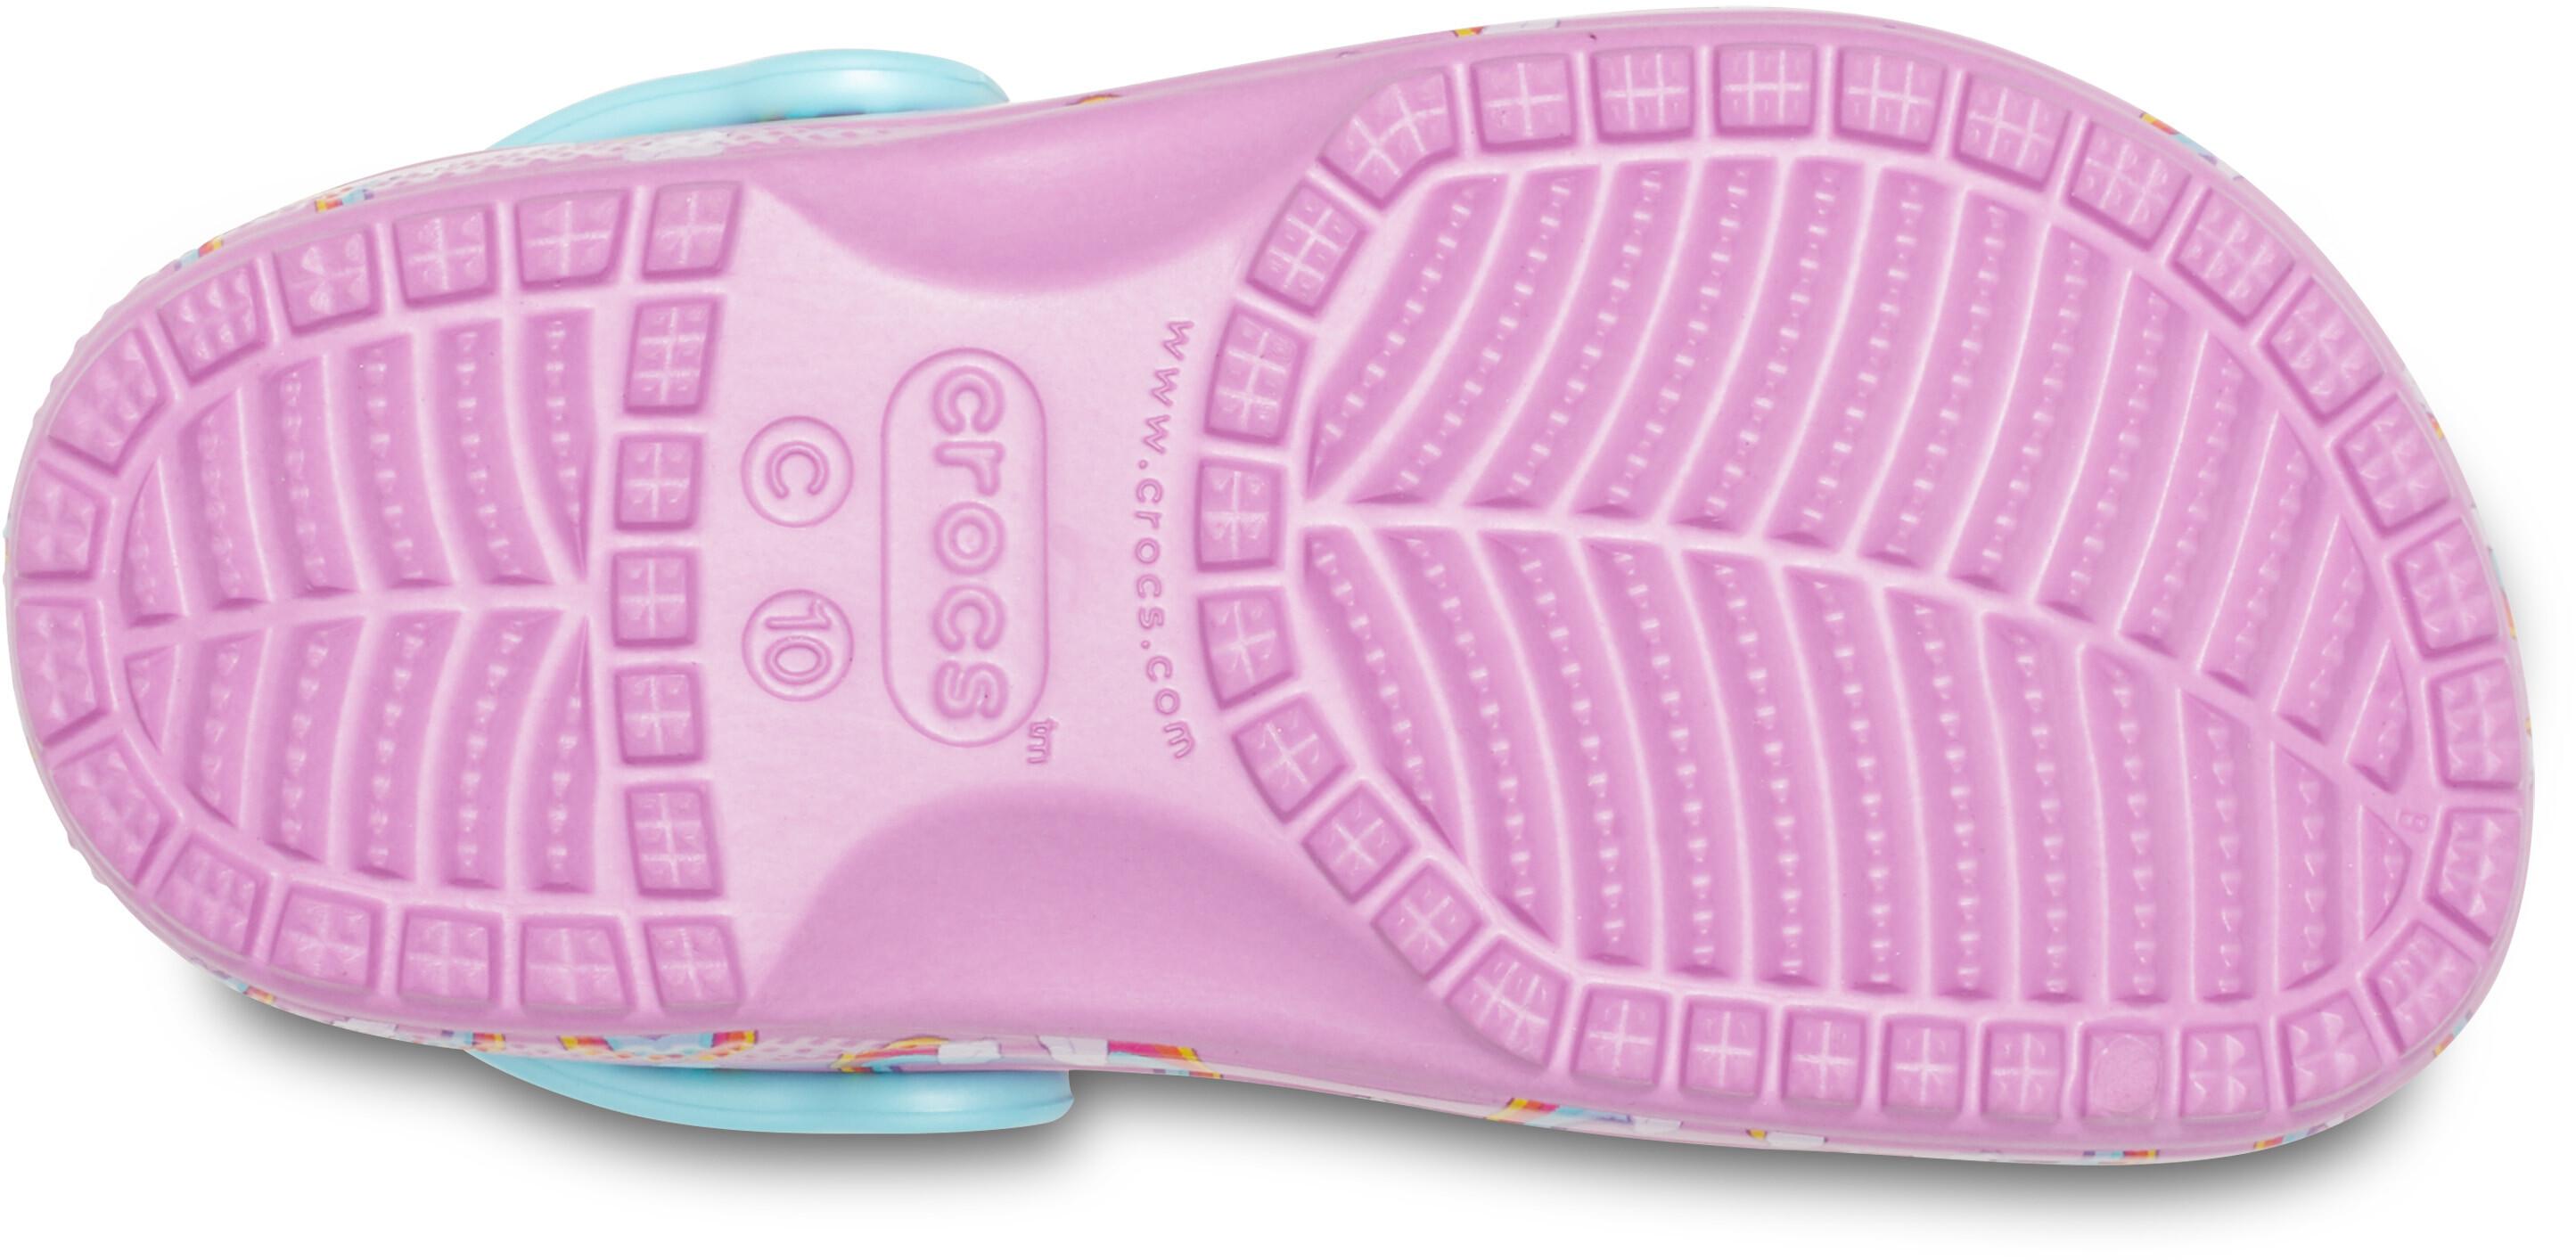 7e432bf5d Crocs Classic Seasonal Graphic Sandals Children purple turquoise at ...